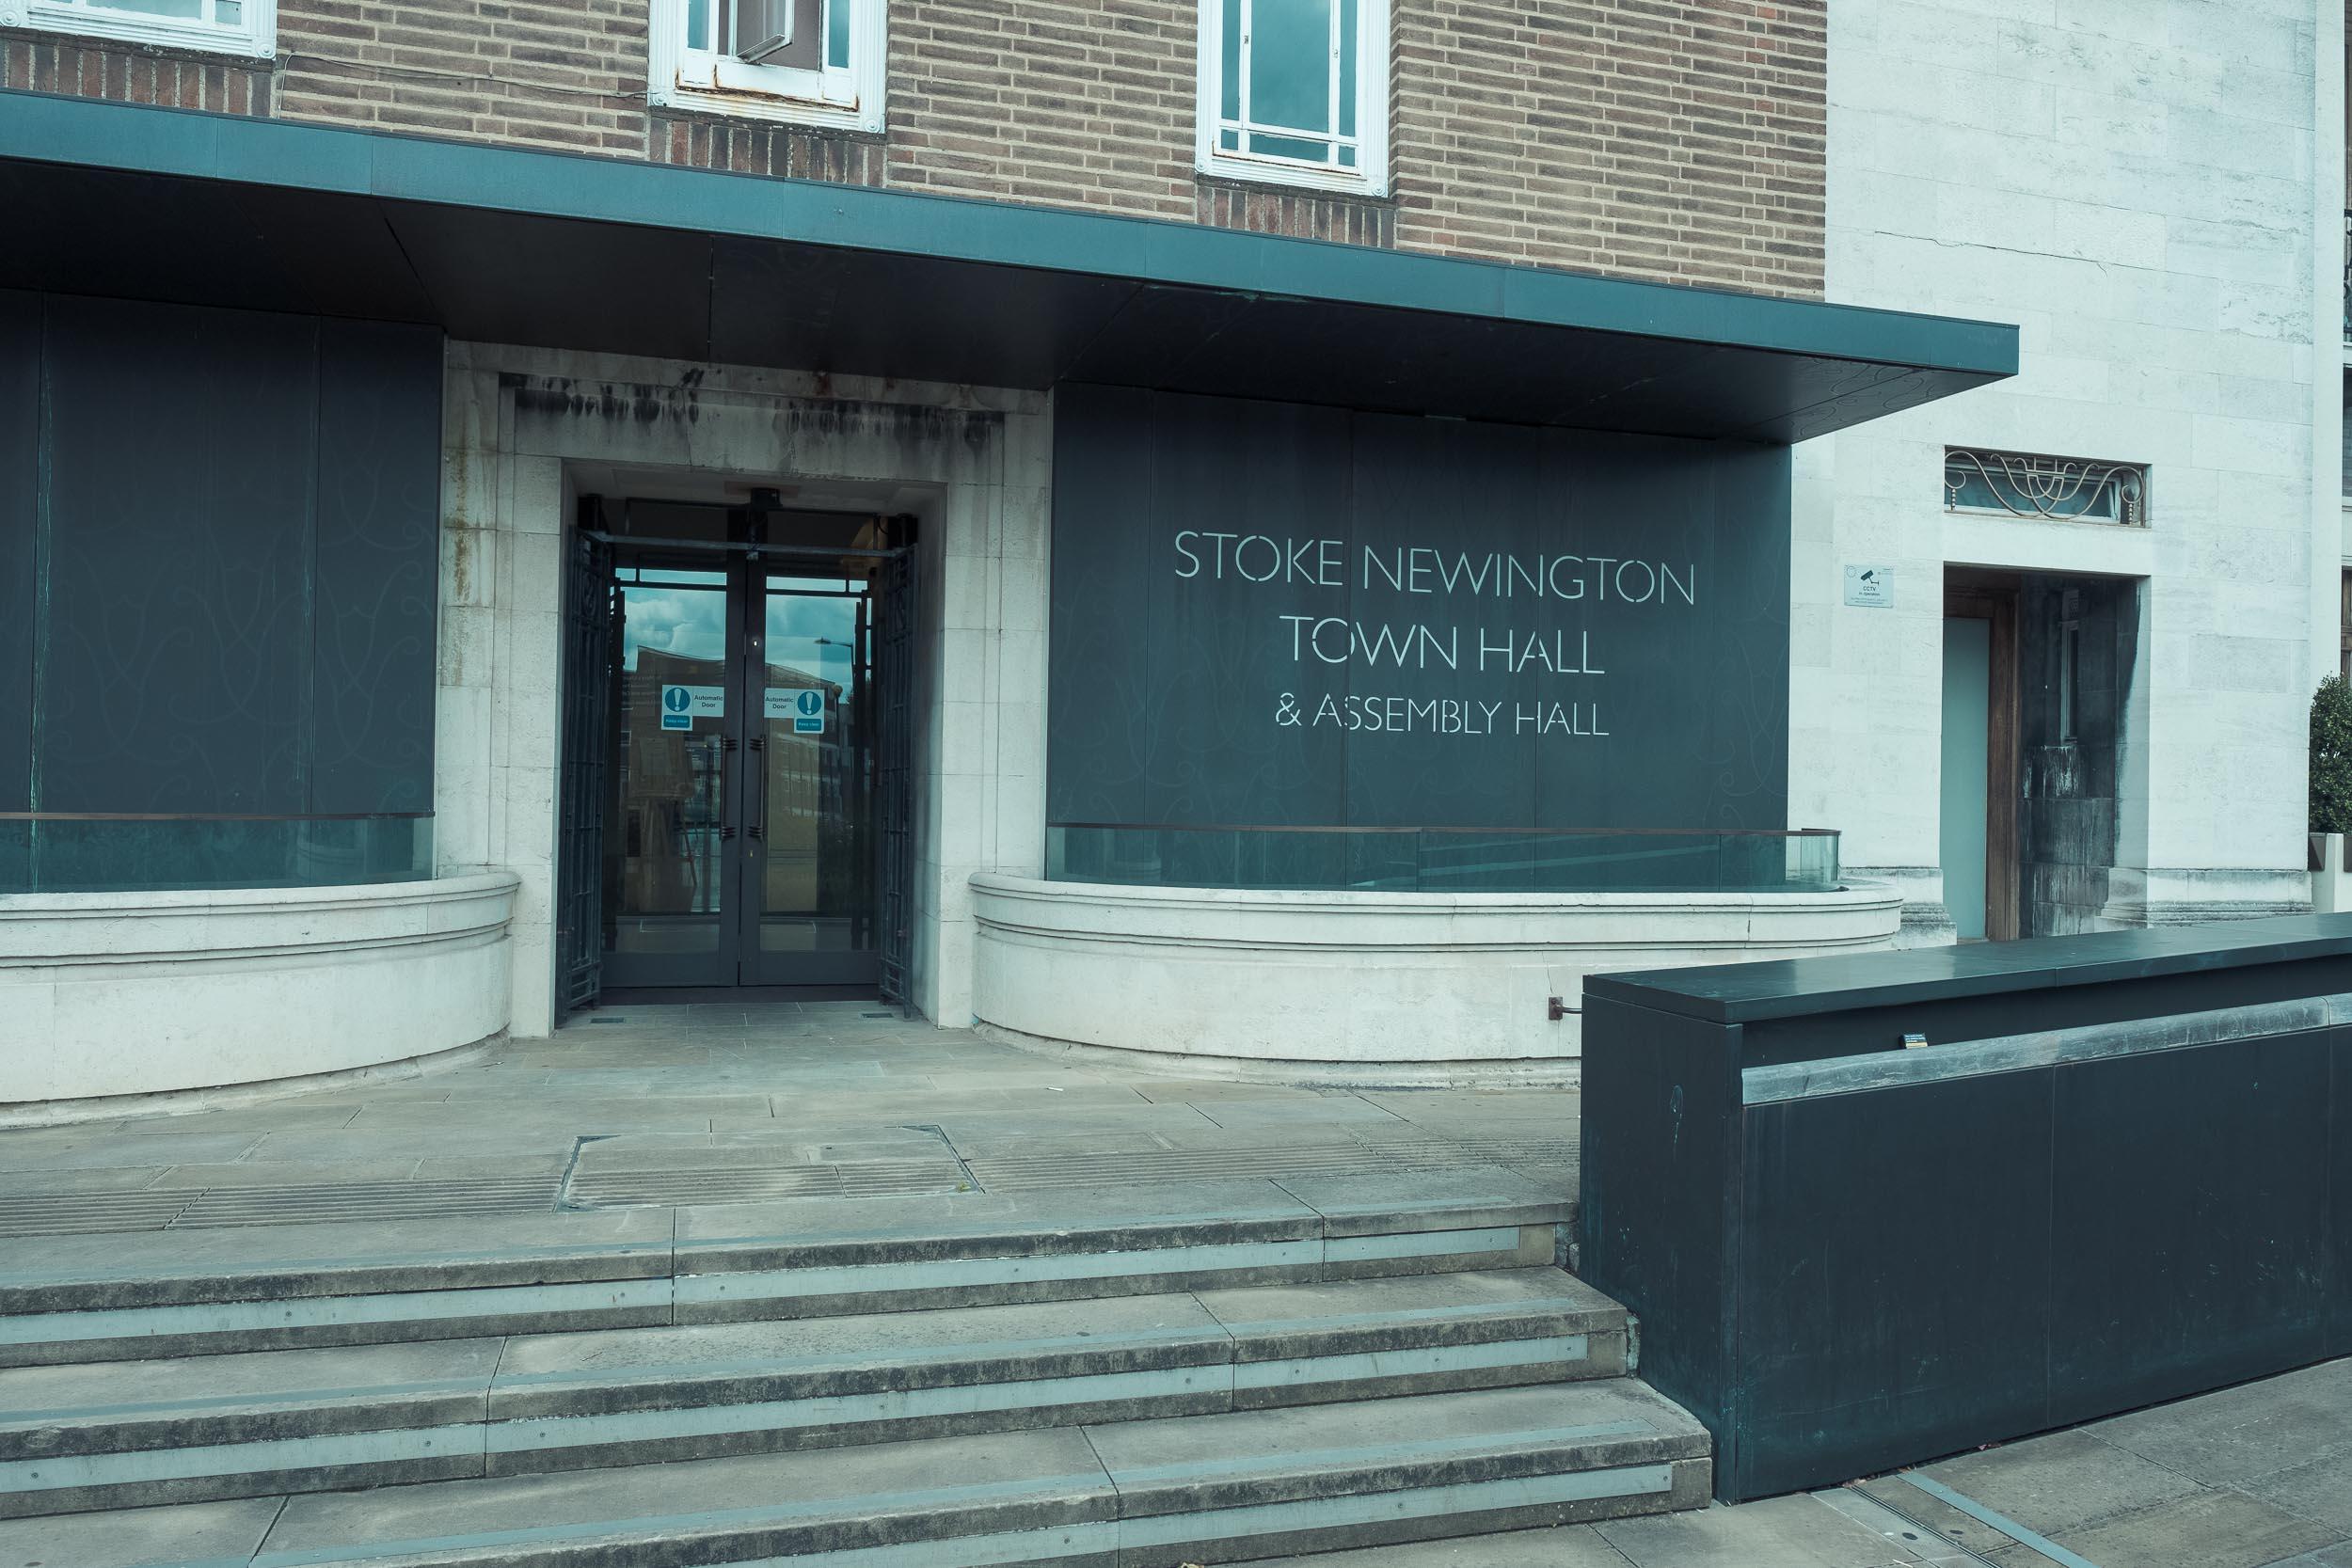 stoke-newington-town-hall-londesborough-001.jpg